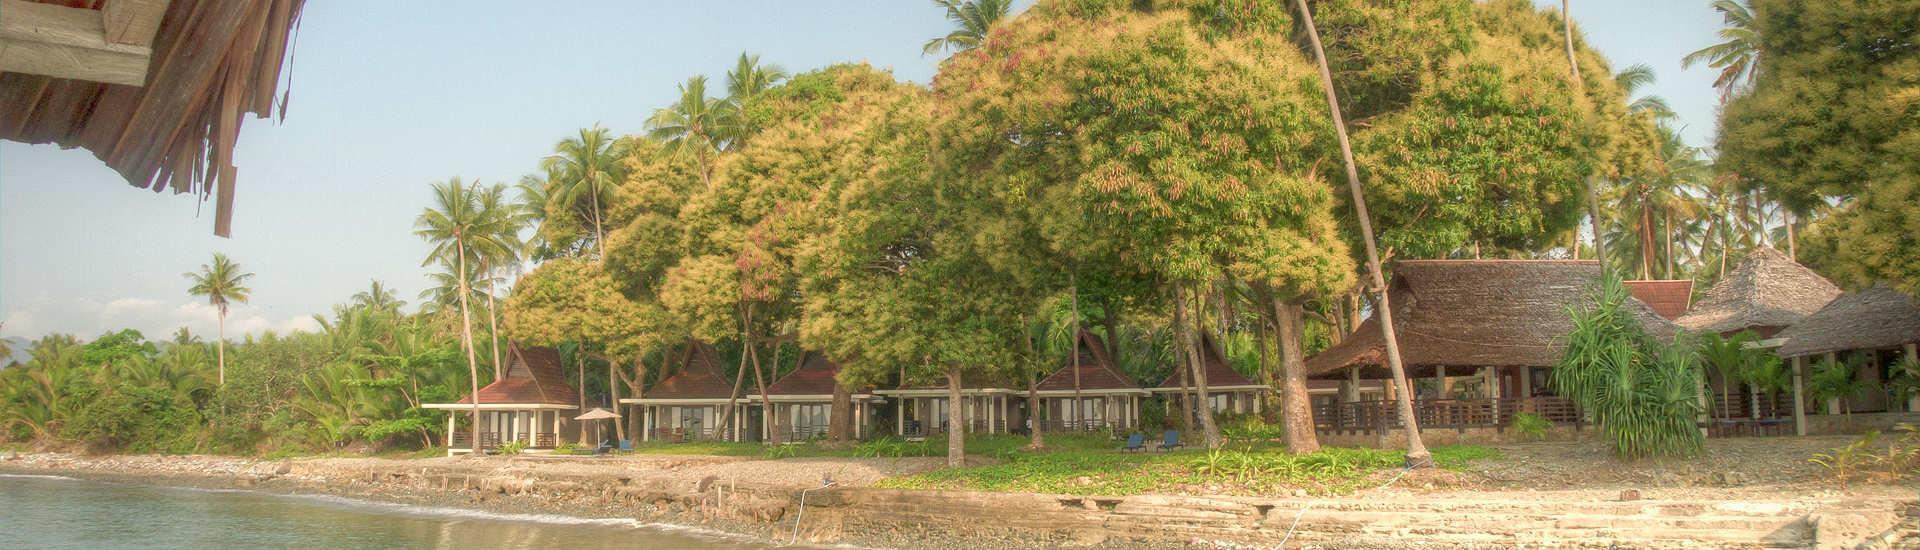 Maluku Divers Resort – Ambon, Indonesien